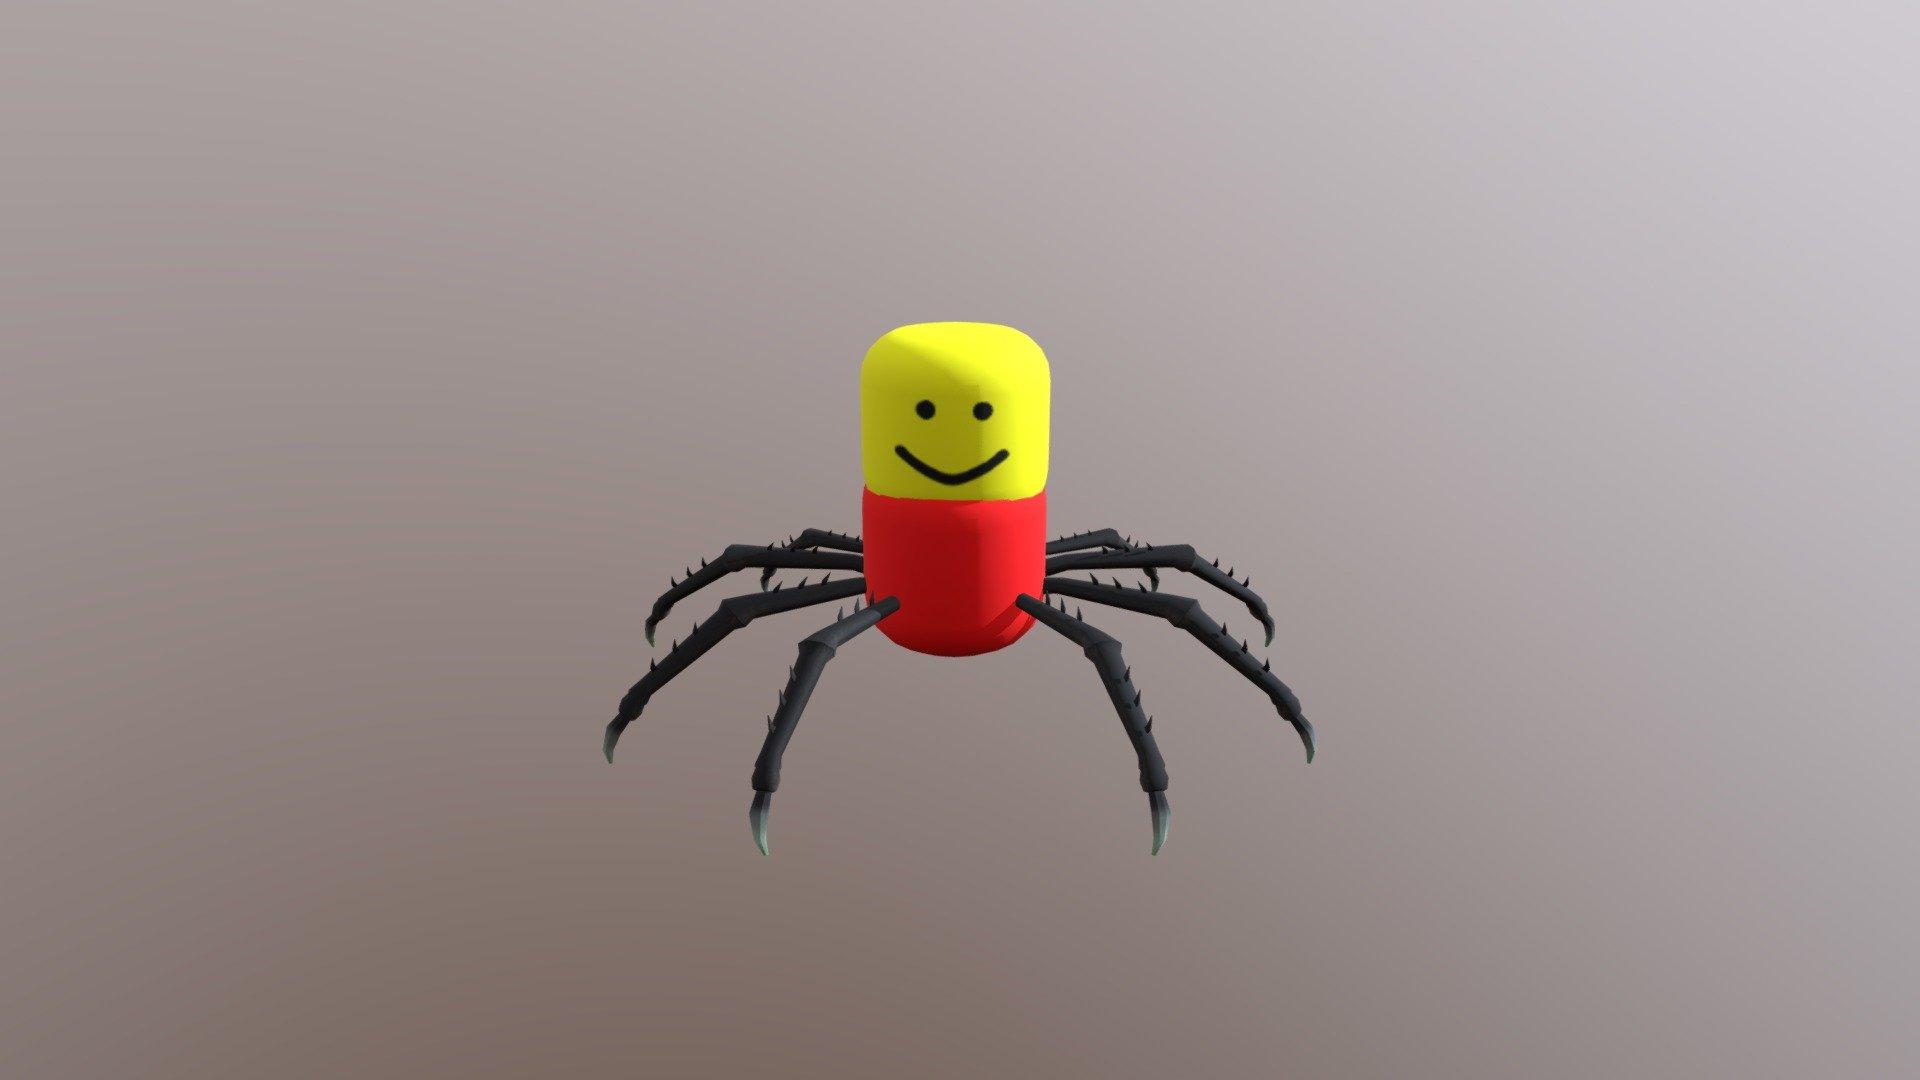 Spider Roblox Avatar Despacito Spider Model Download Free 3d Model By Retroblock Thenintendobomb F2a5059 Sketchfab